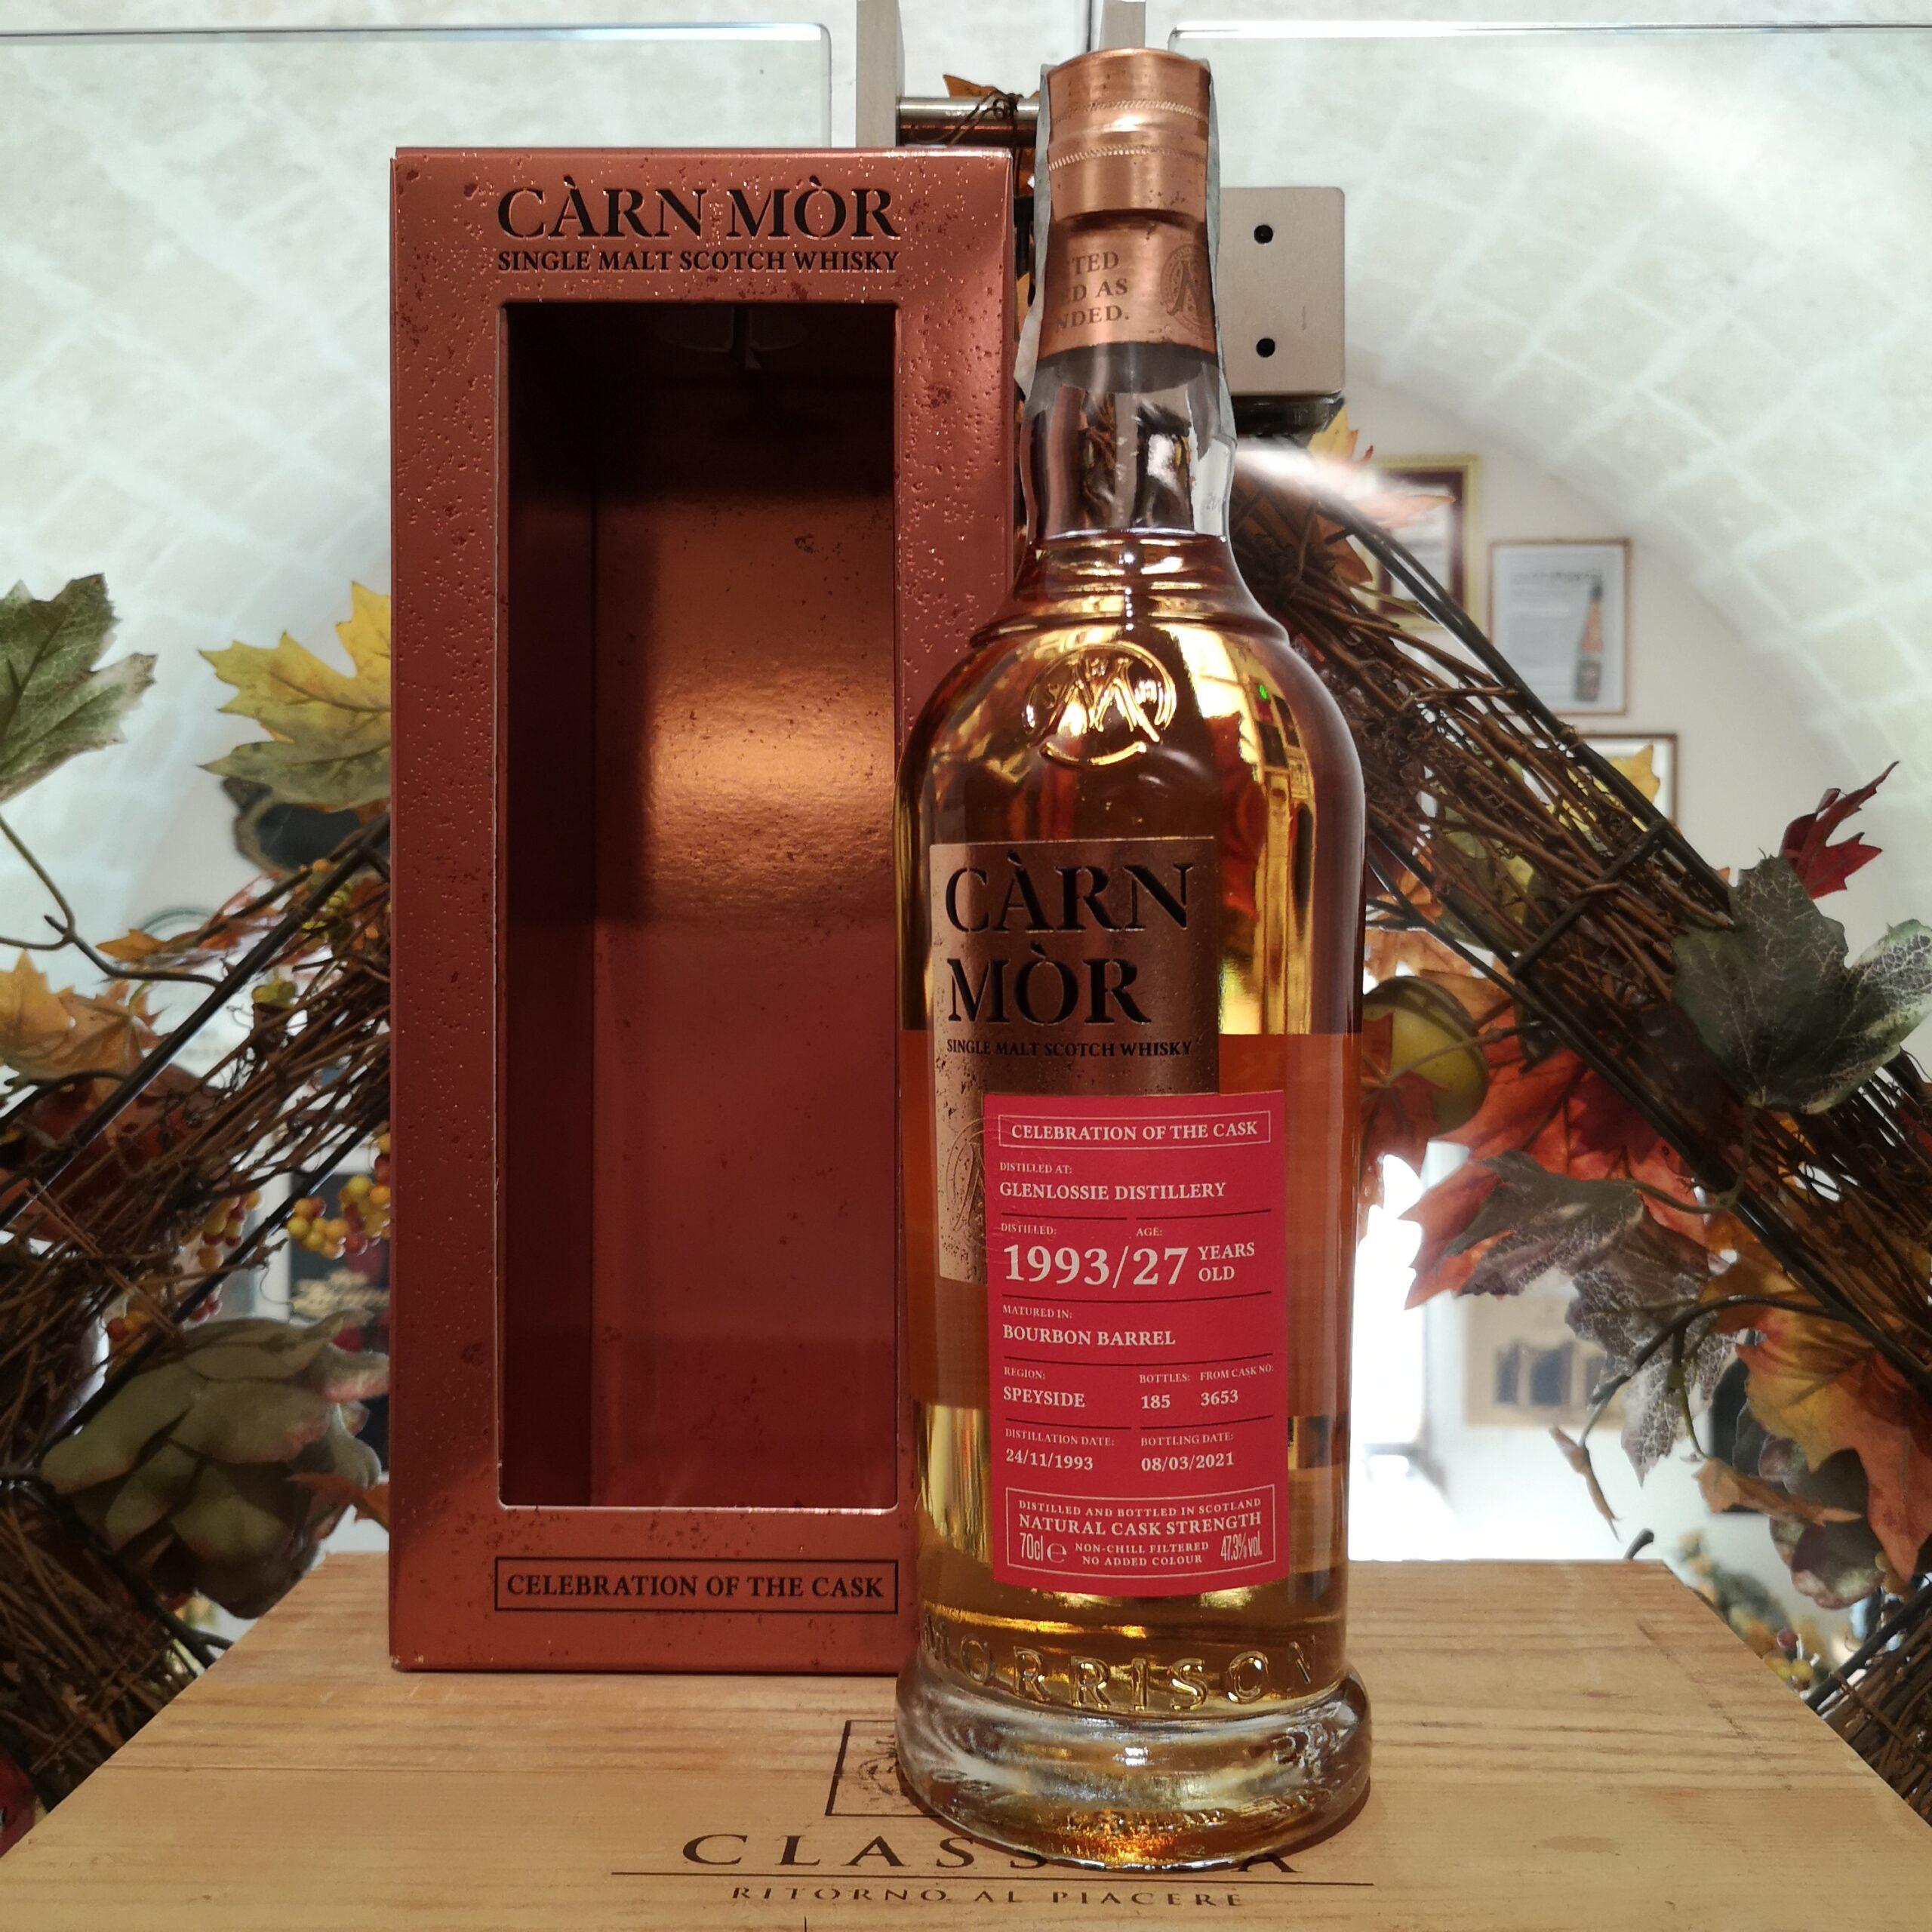 Càrn Mòr Celebration of the Cask Glenlossie Single Malt Scotch Whisky 1993 27 YO 3653